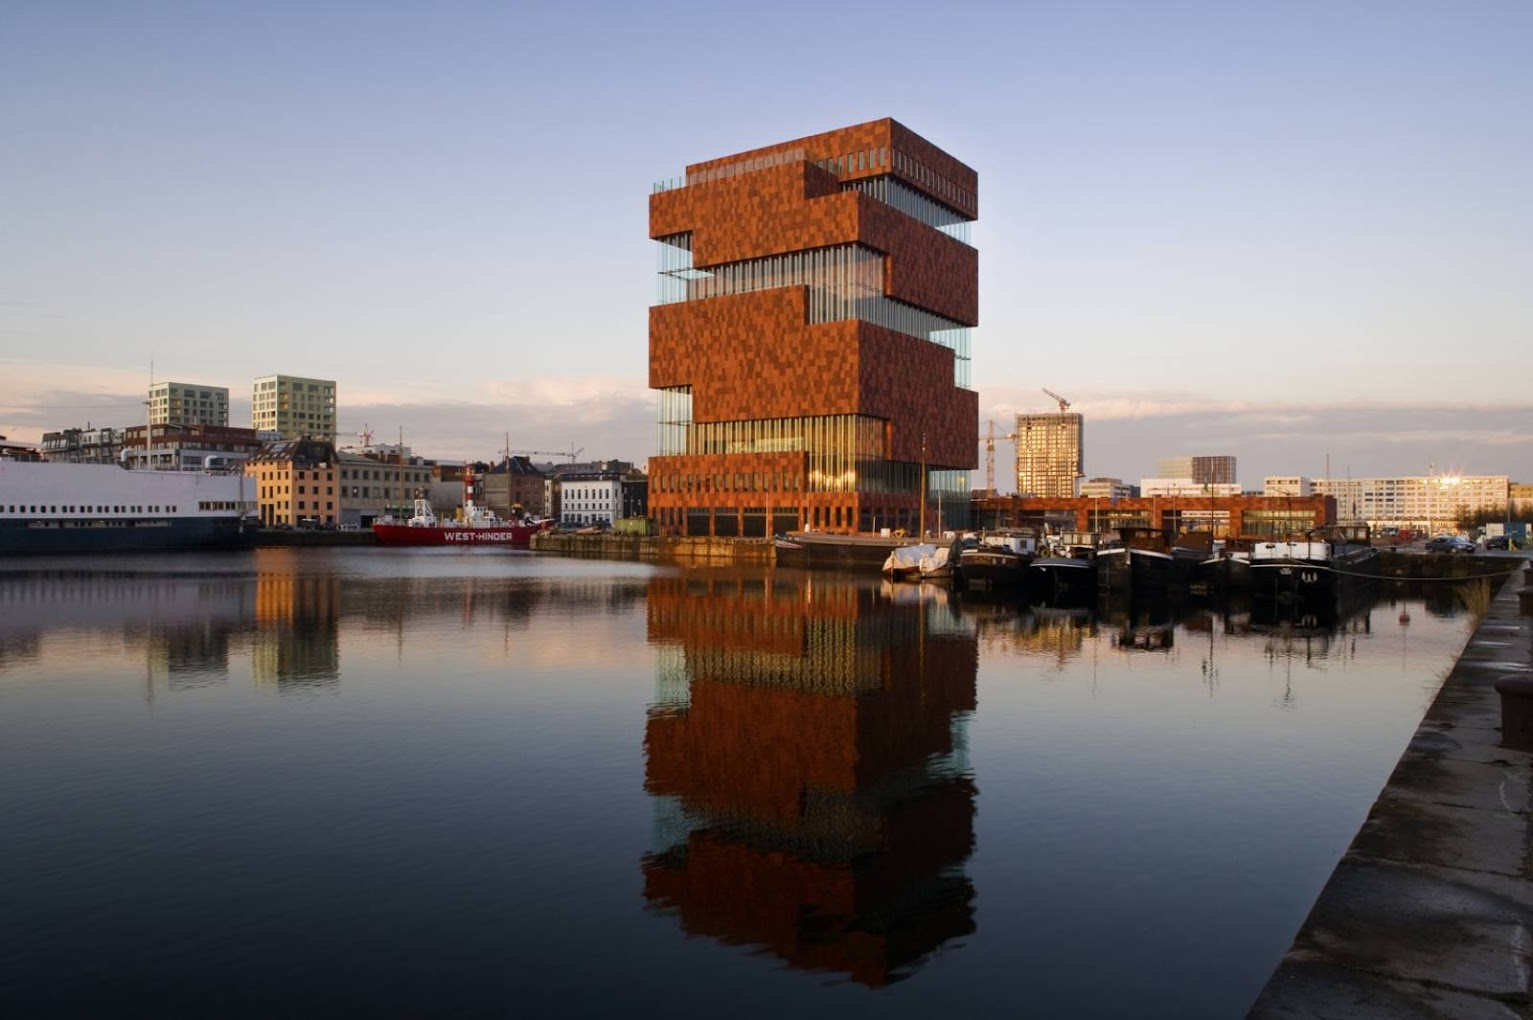 Hanzestedenplaats, 2000 Anversa, Belgio: Museum Aan De Stroom by Neutelings Riedijk Architects